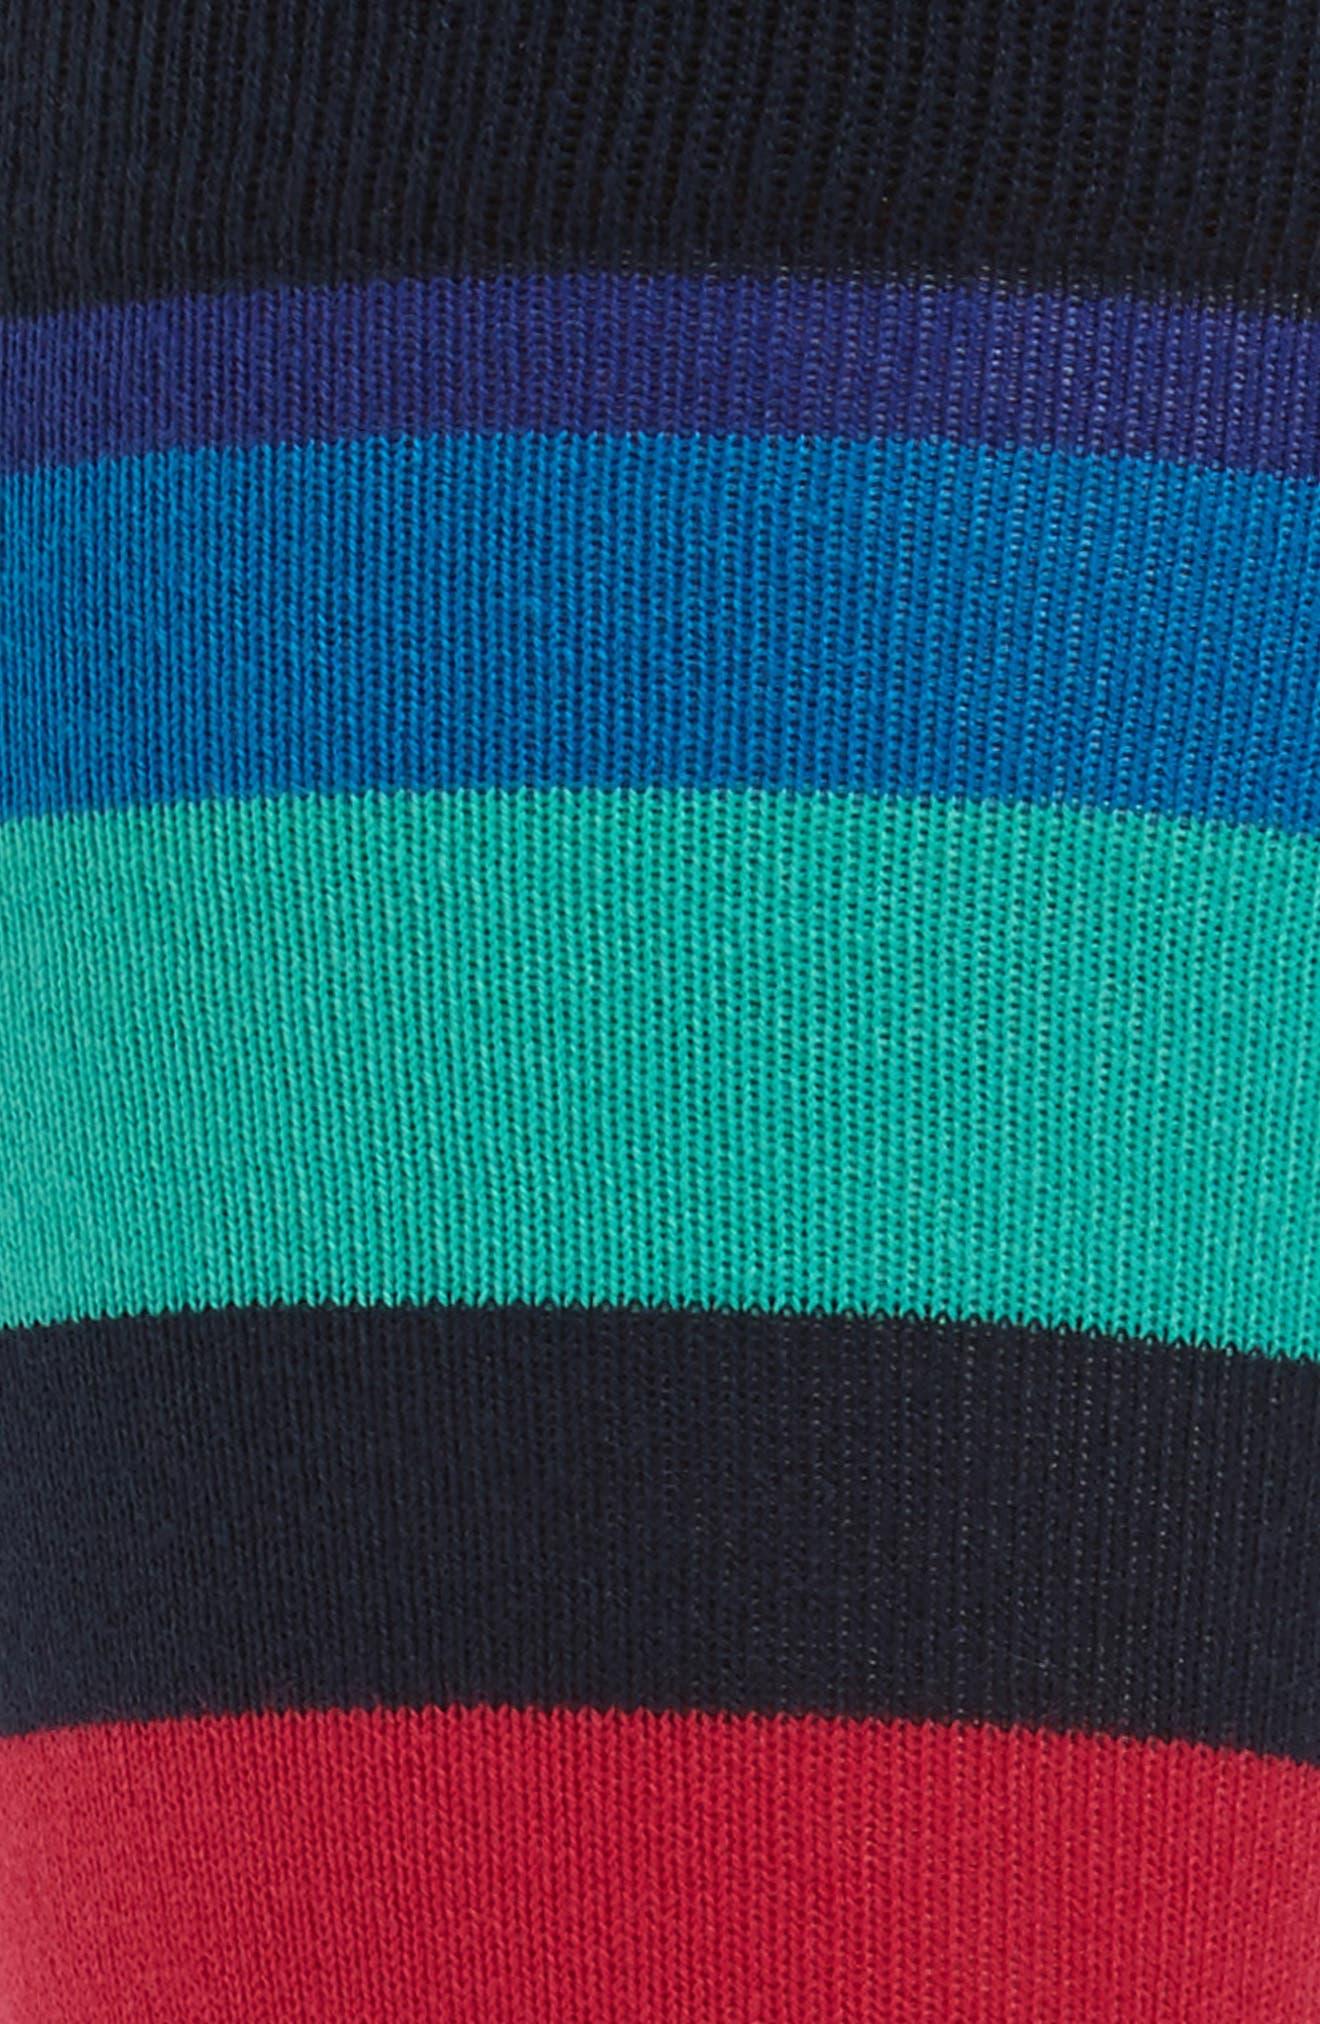 Stripe Socks,                             Alternate thumbnail 2, color,                             Blue Multi